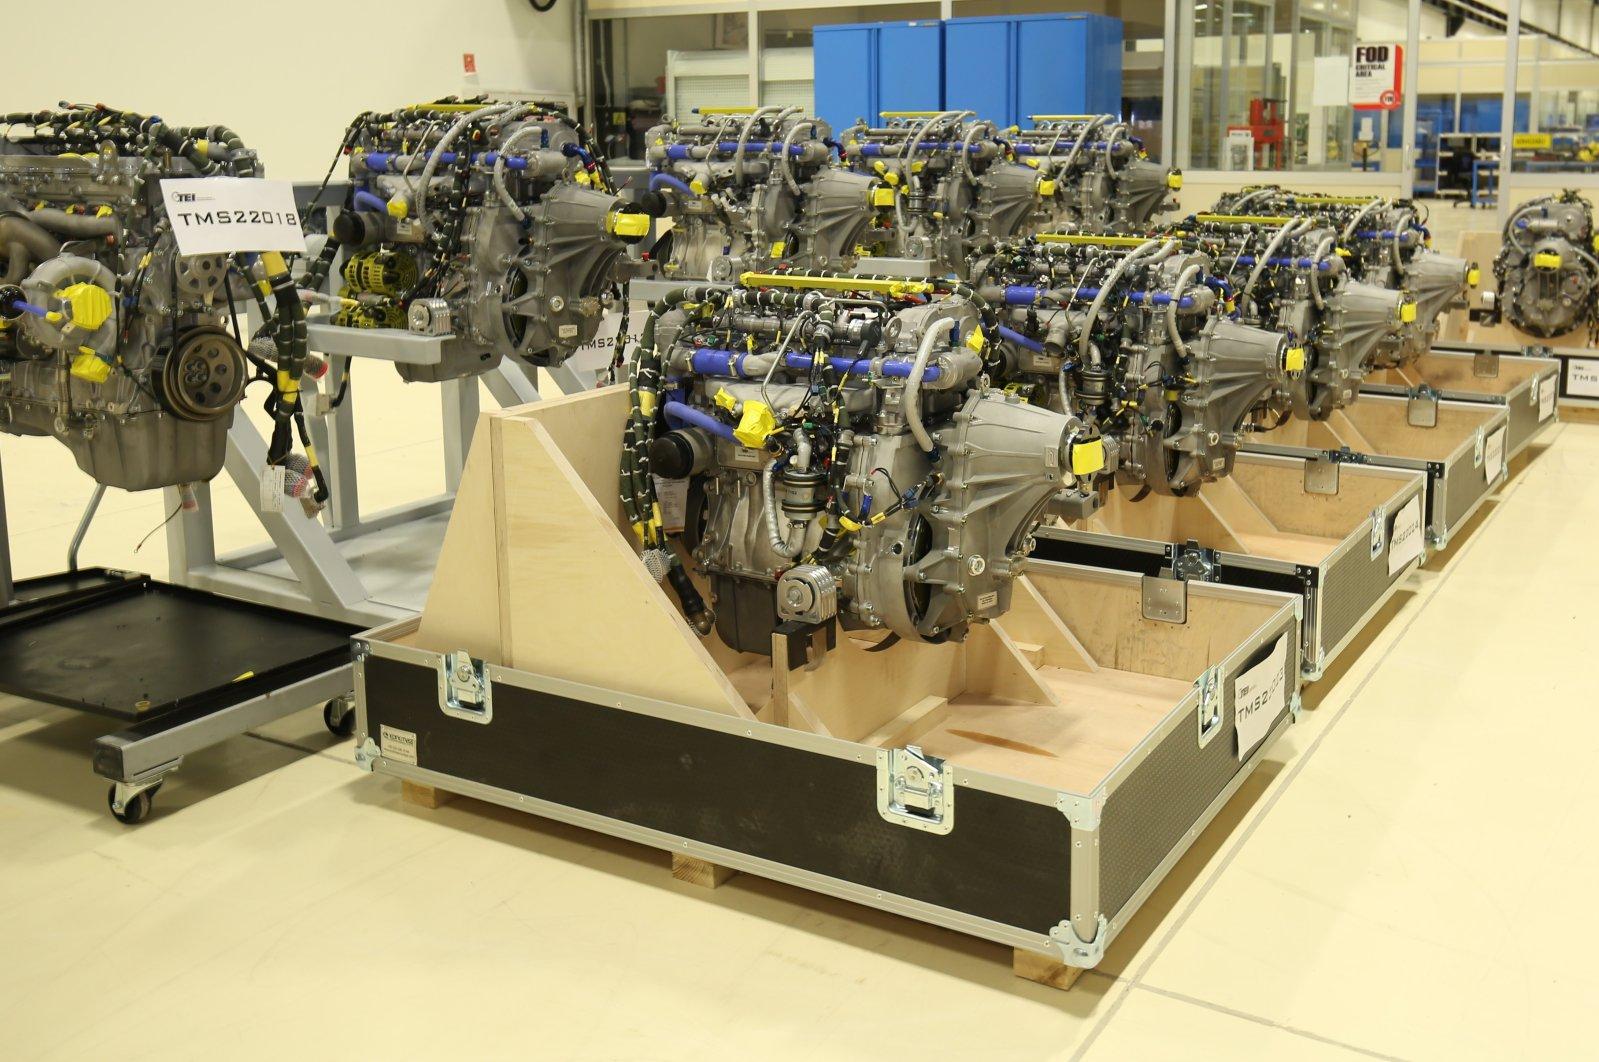 UAV engines produced by Turkey's TEI at its facility in Eskişehir, central Turkey, Aug. 12, 2020. (Photo by TEI via AA)